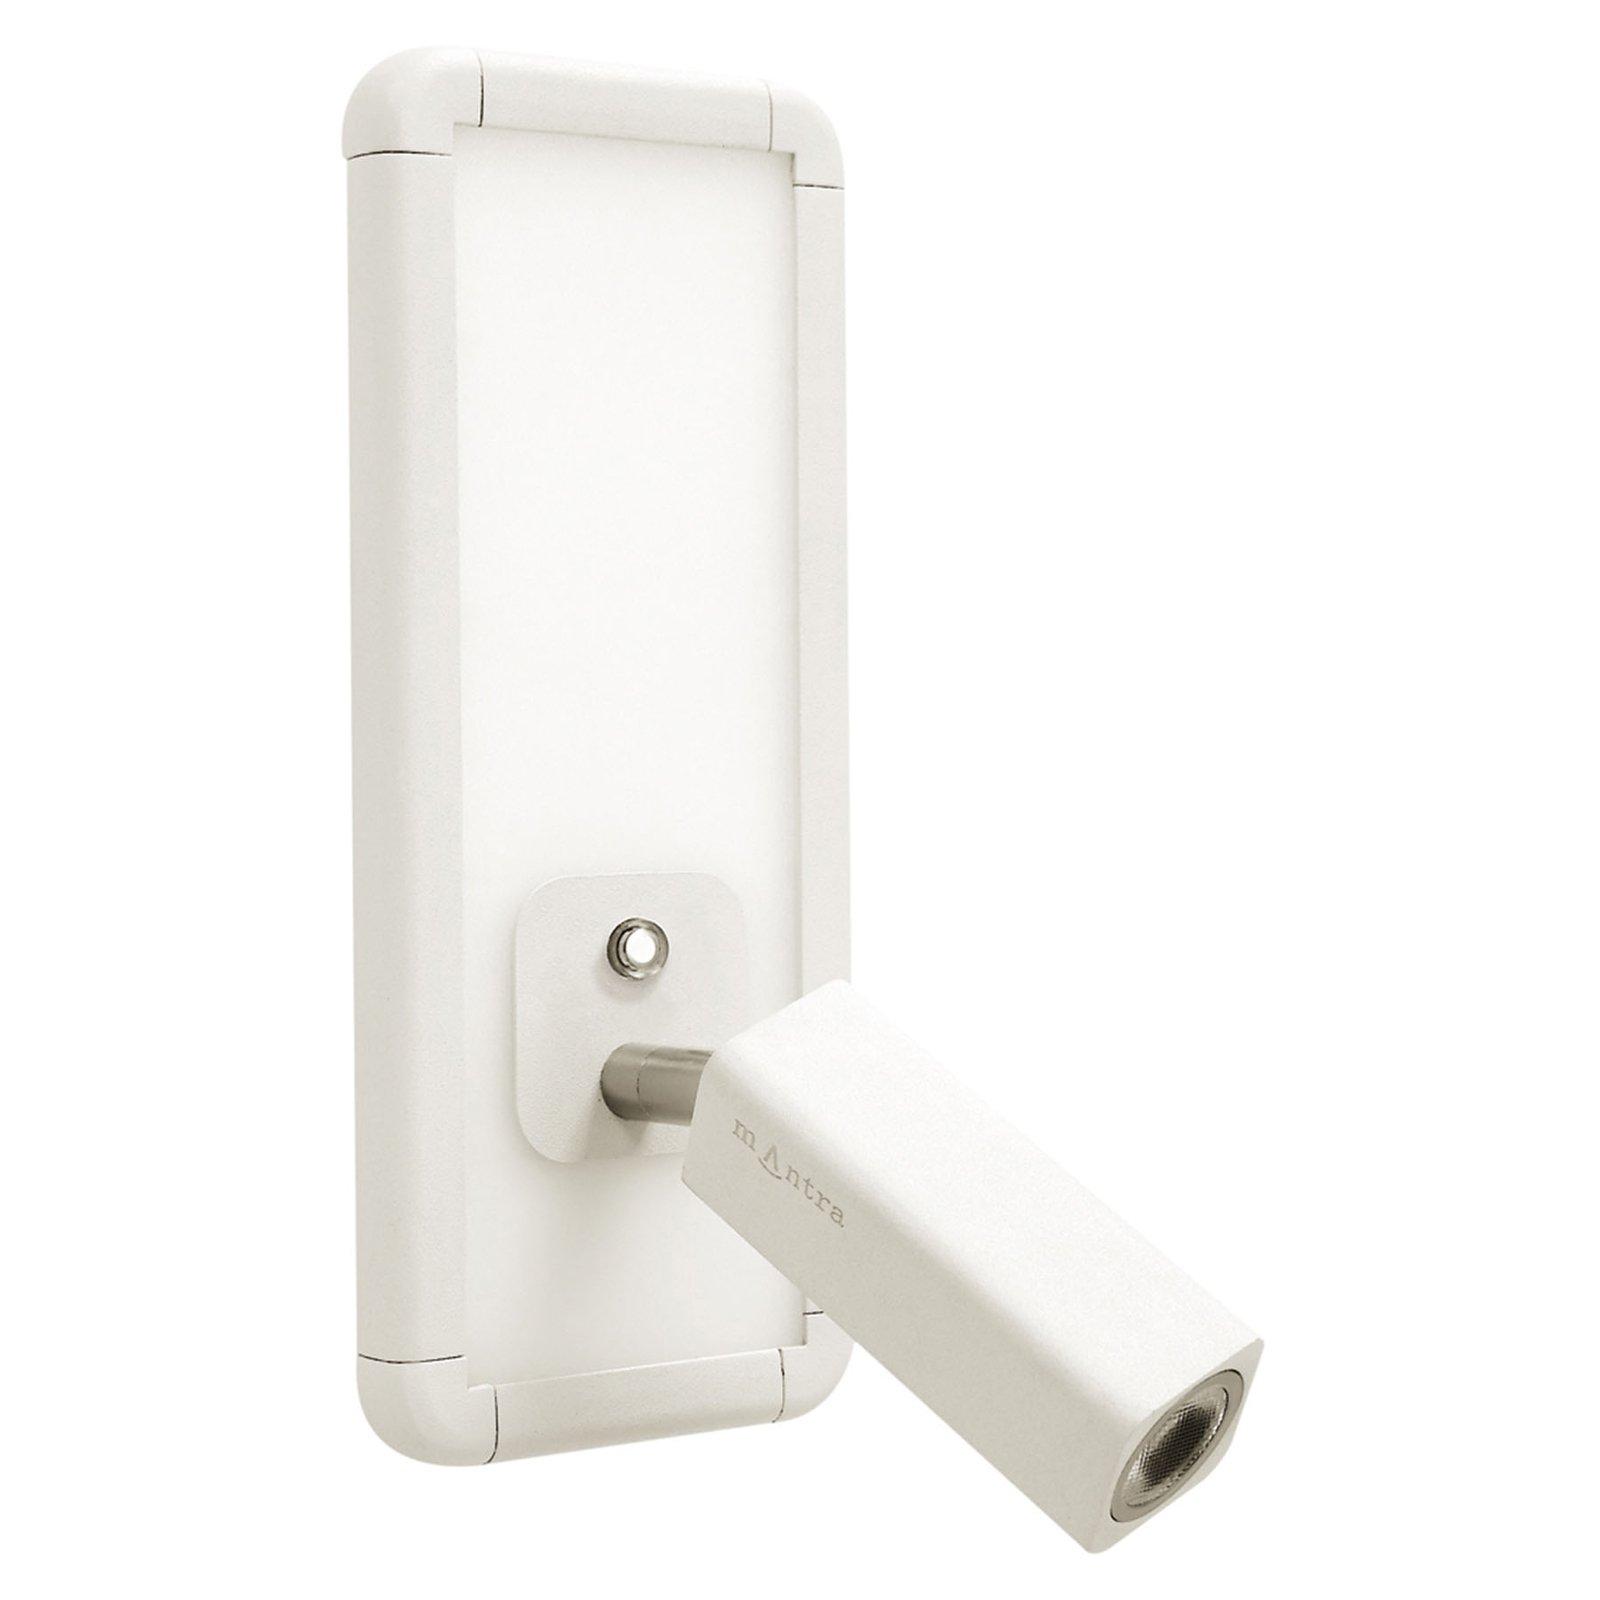 Ibiza LED-vegglampe med lesearm, hvit